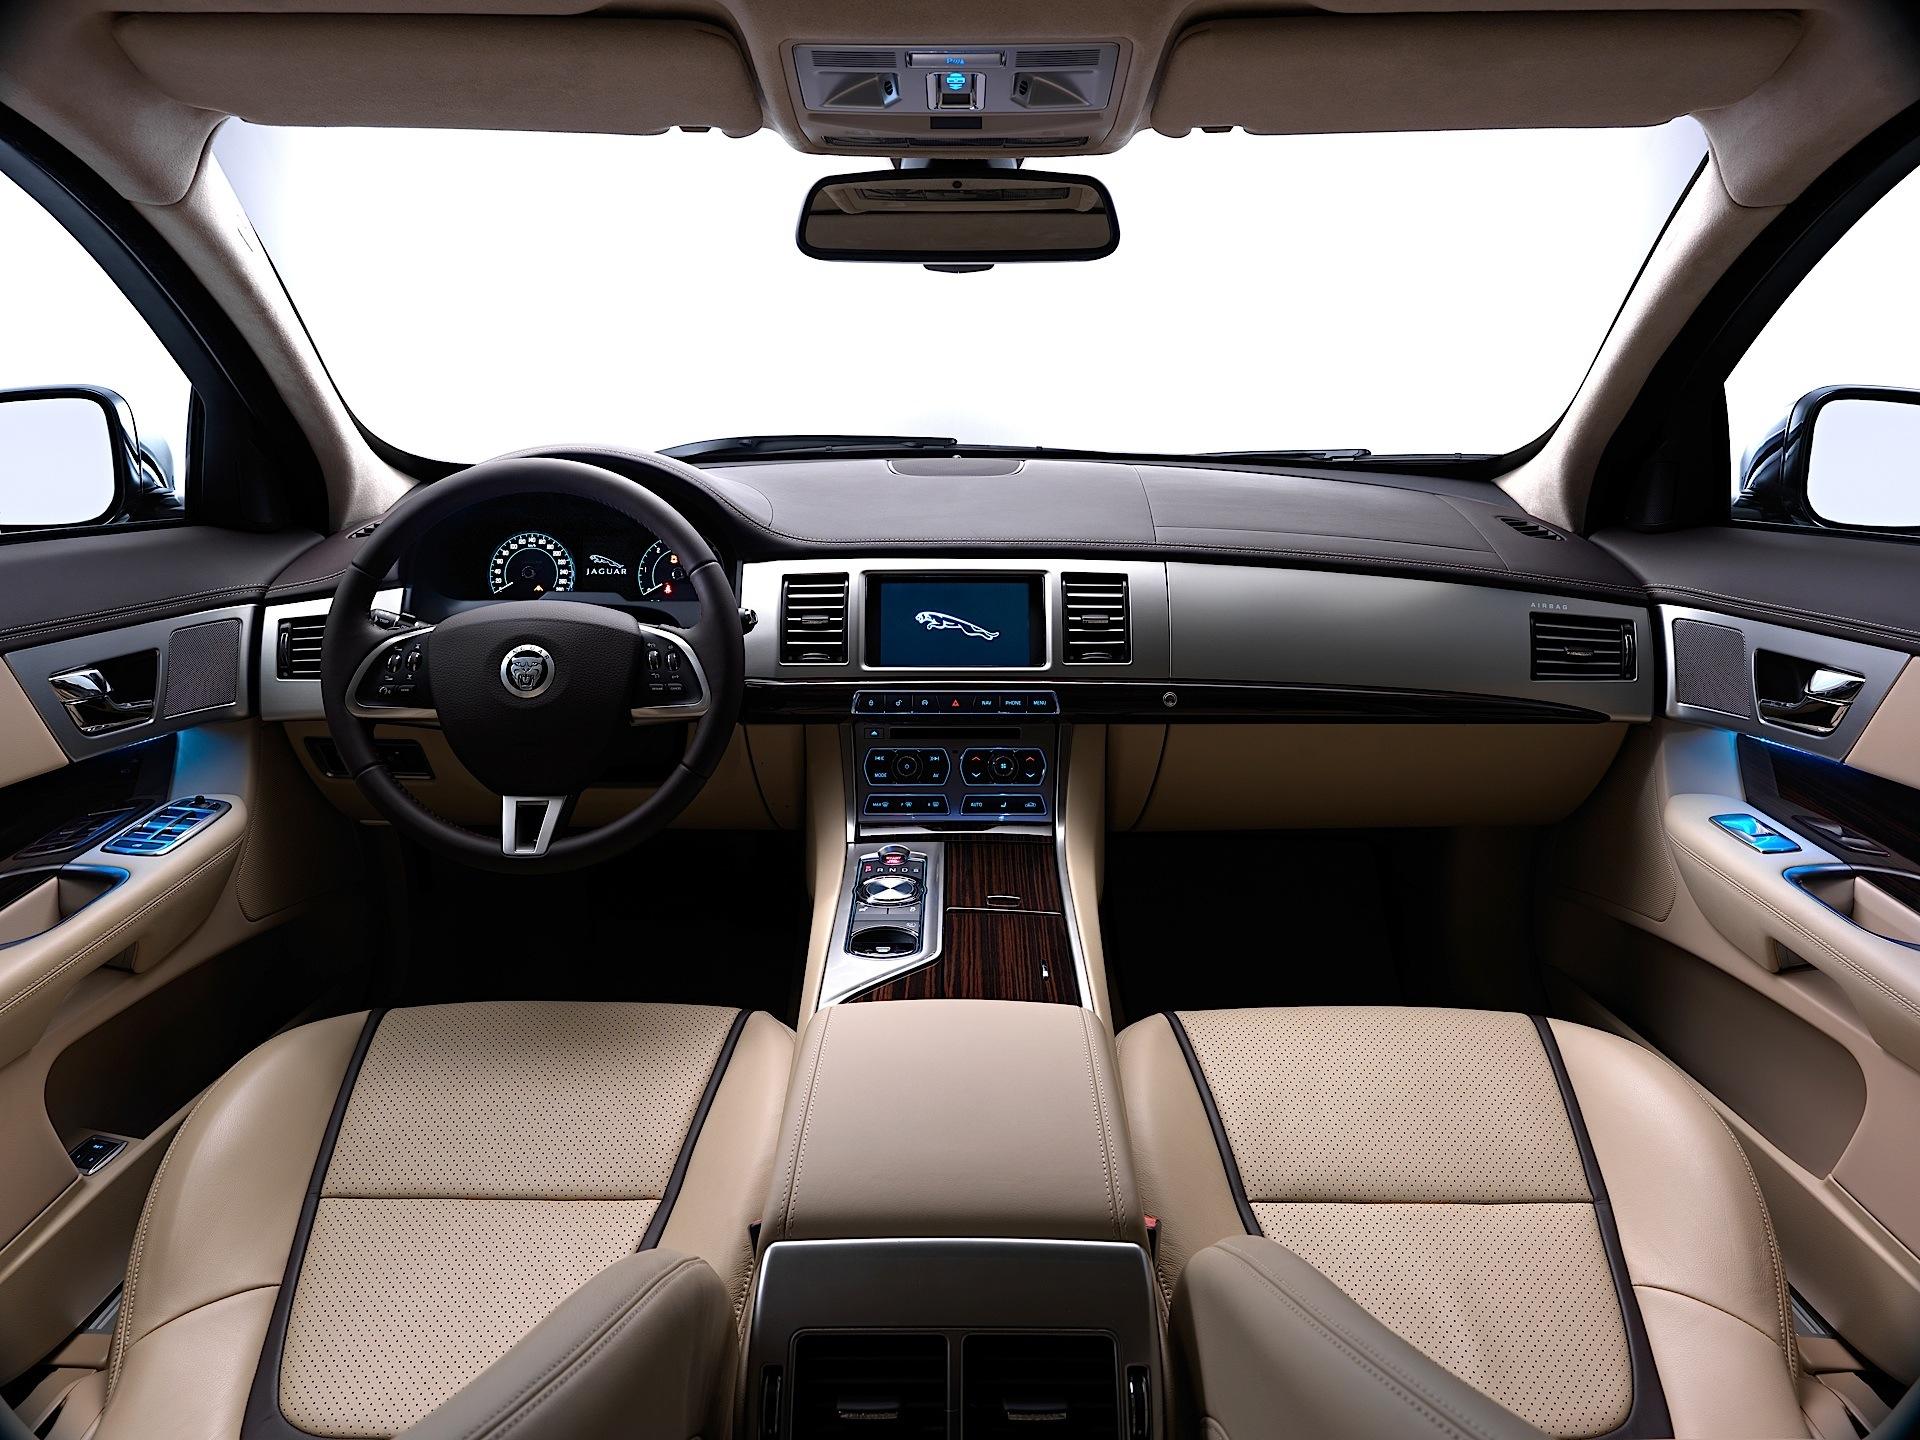 jaguar xf specs 2012 2013 2014 2015 autoevolution. Black Bedroom Furniture Sets. Home Design Ideas